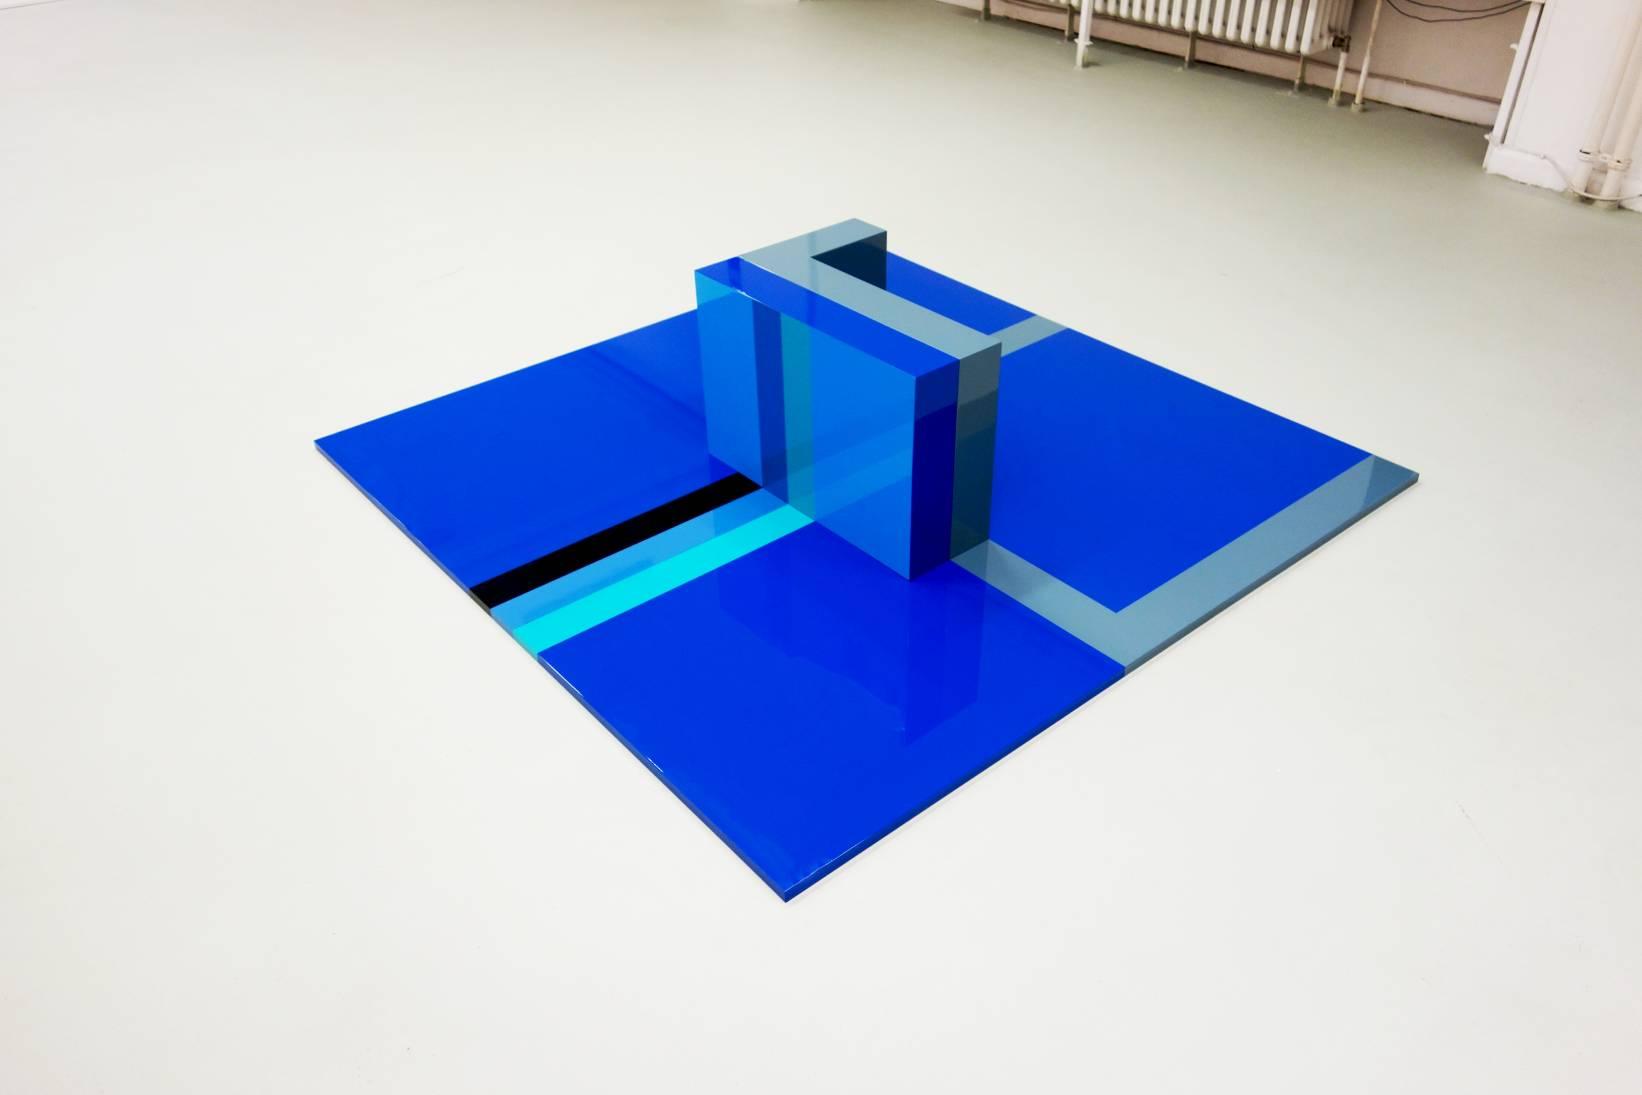 Flat Cube 1 (2019) - Martim Brion